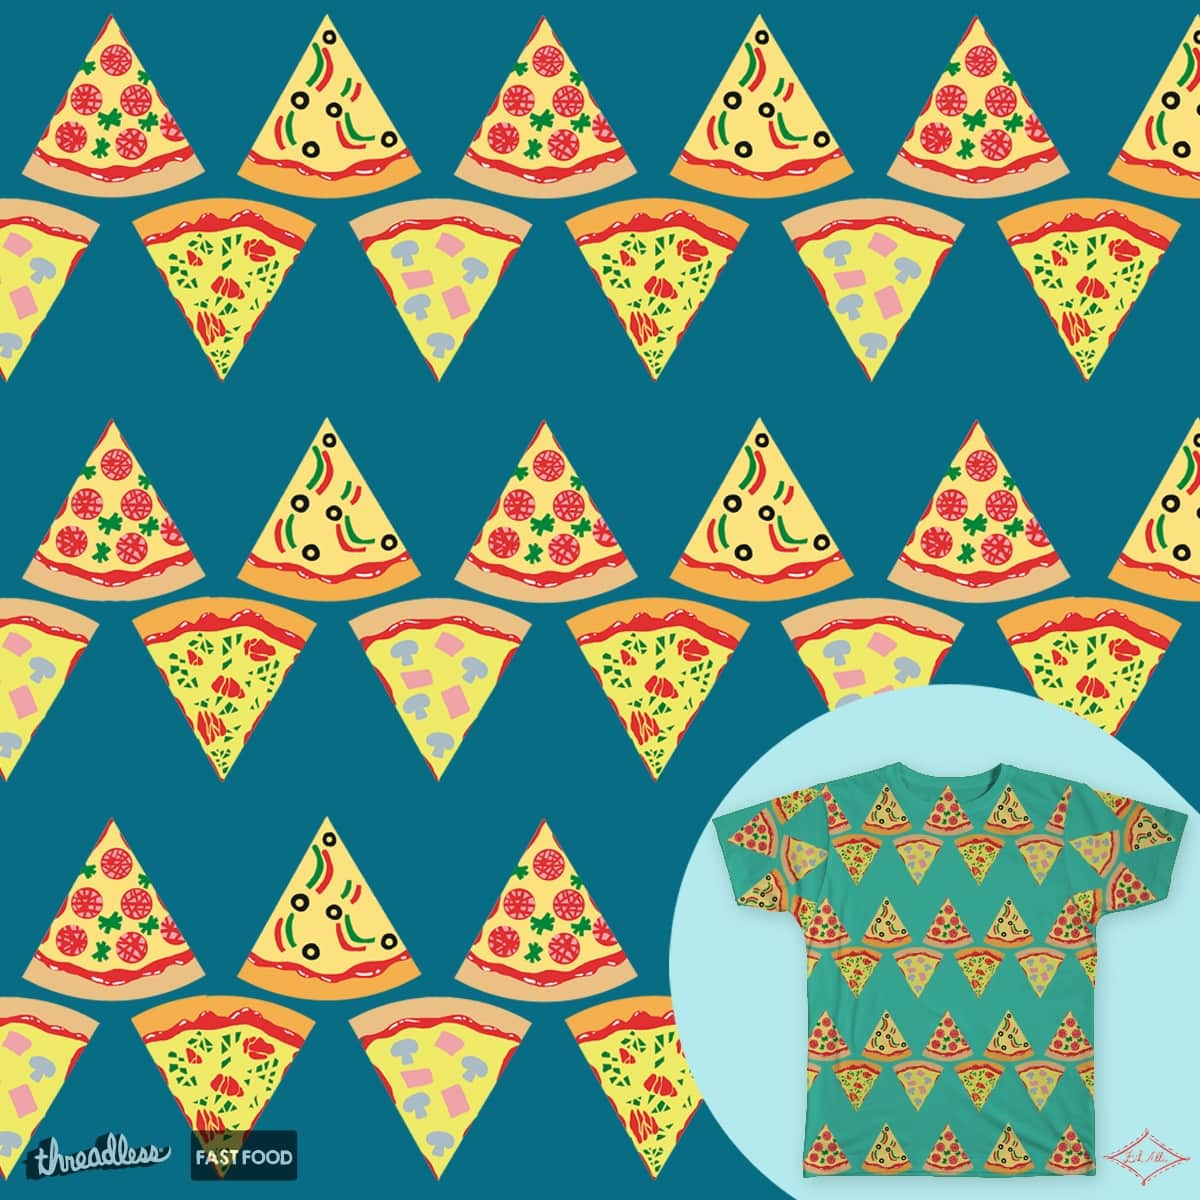 Pizza Zig-zag by Well-es-bien on Threadless